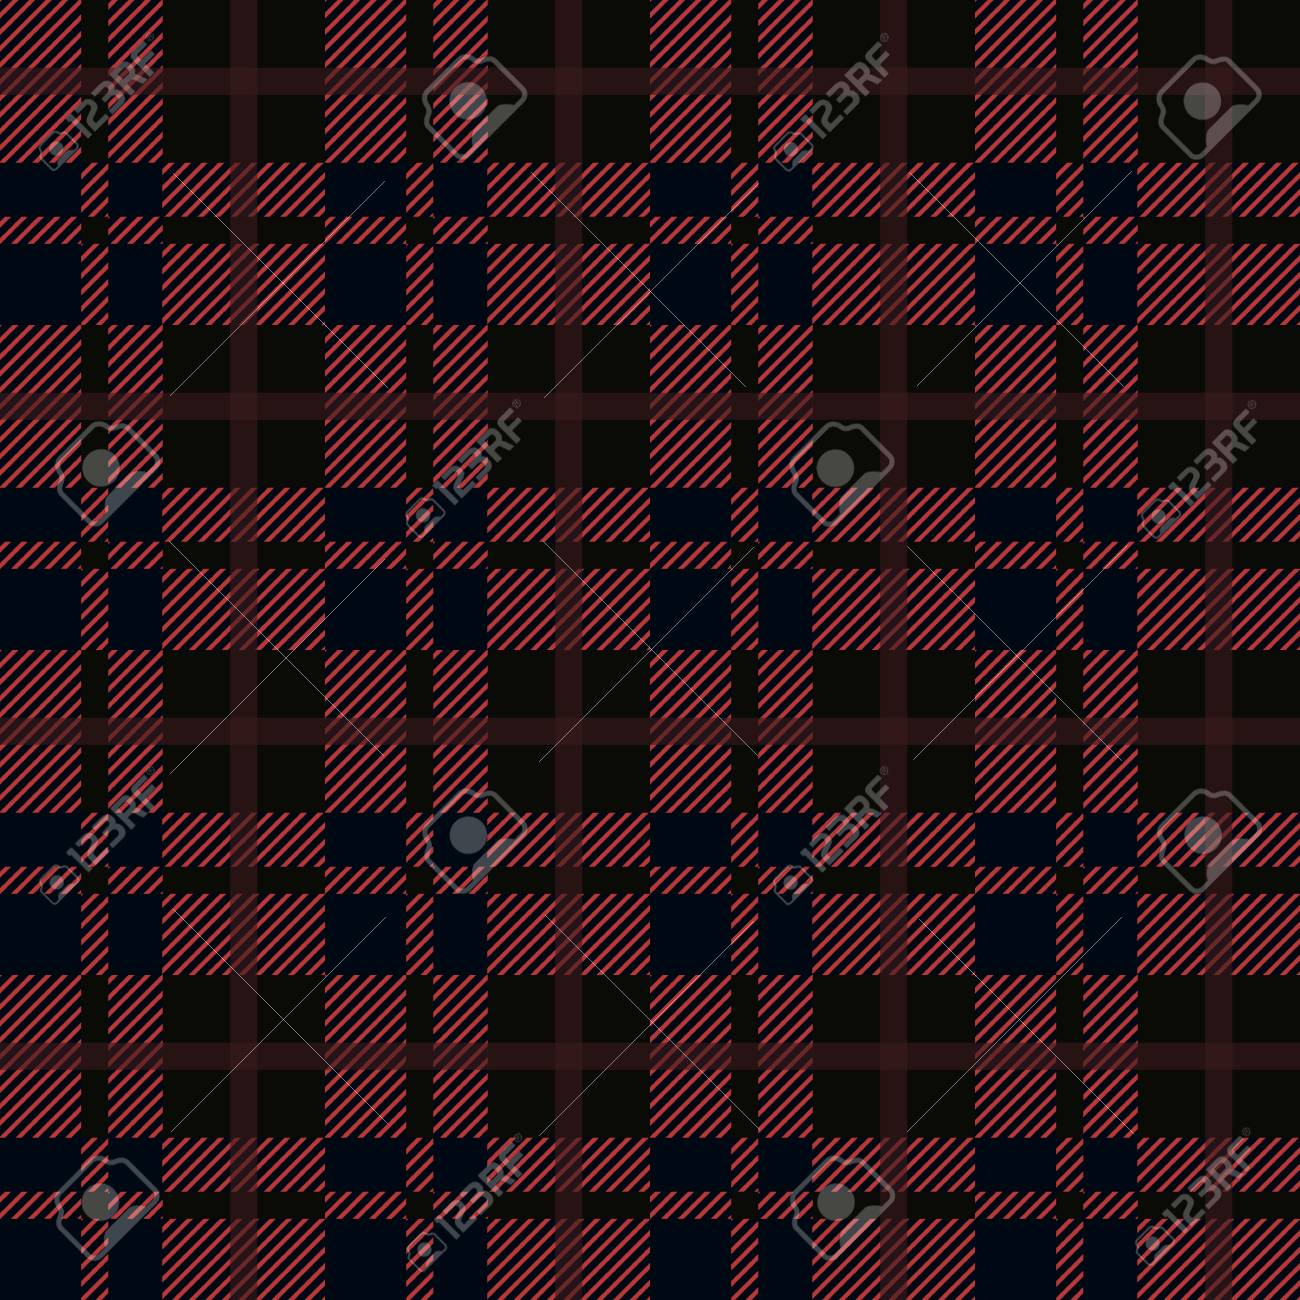 Seamless Red And Black Buffalo Plaid Pattern Checkered Fabric